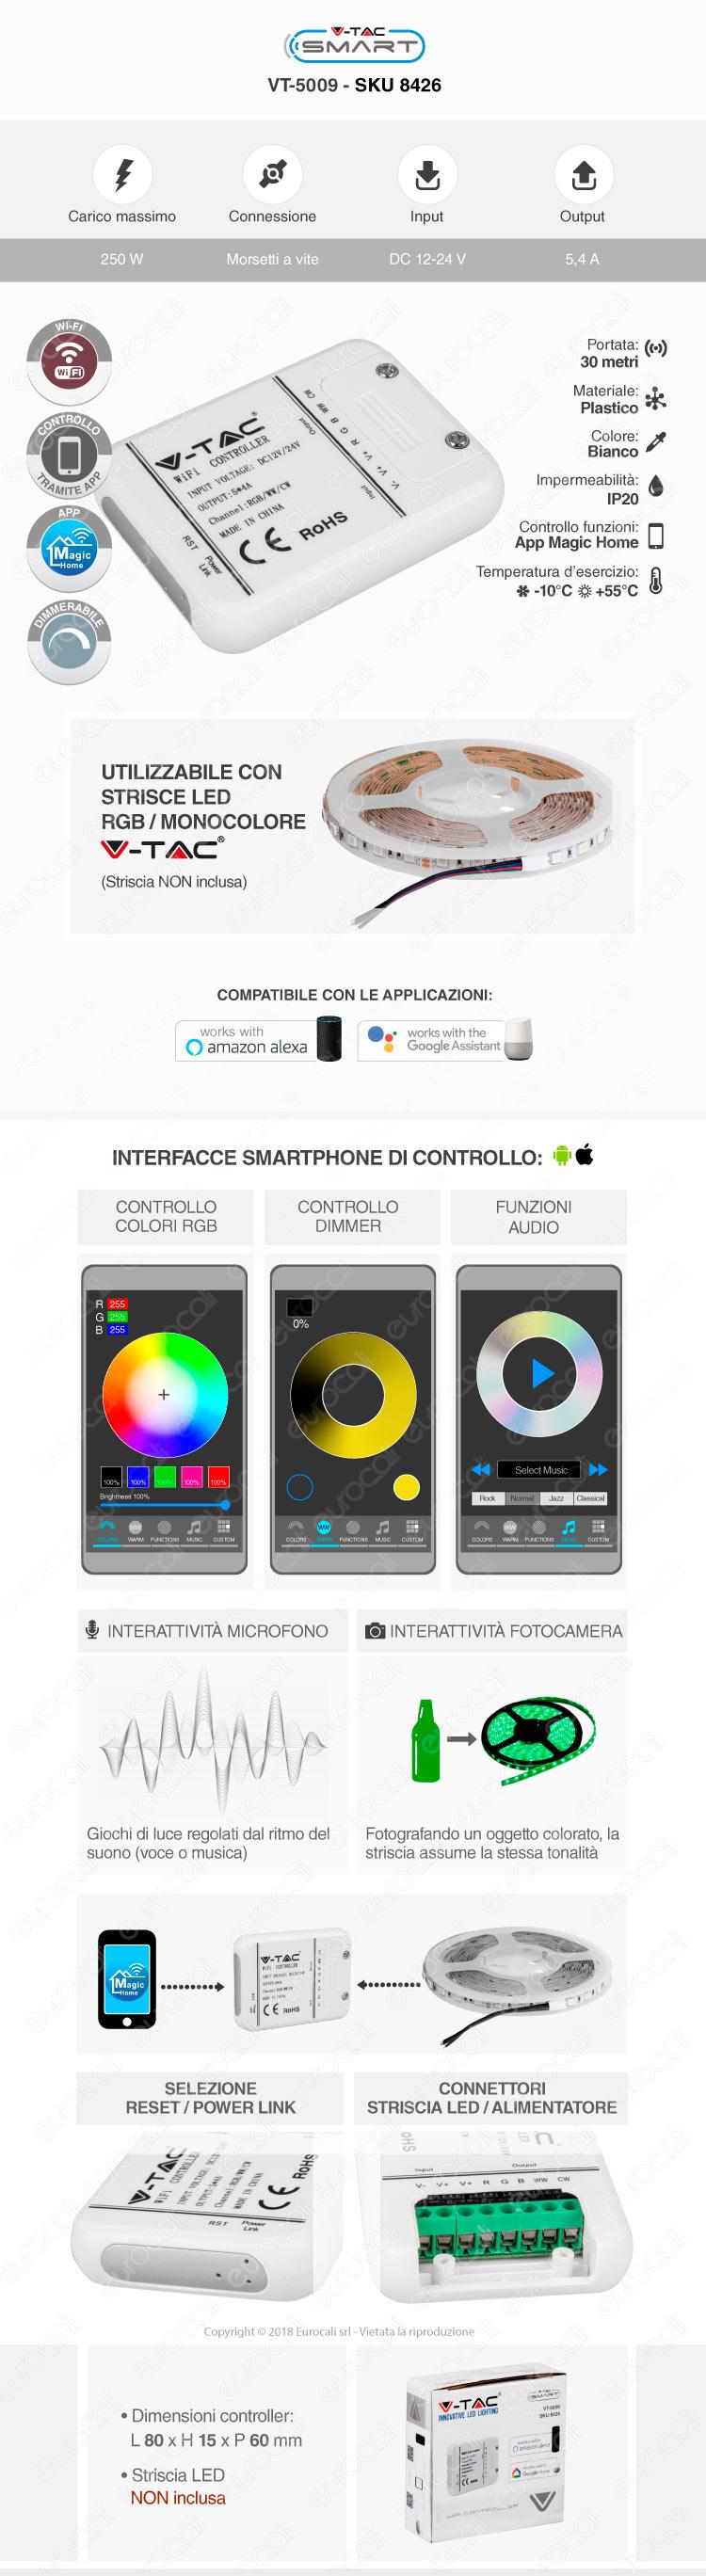 controller per strisce LED